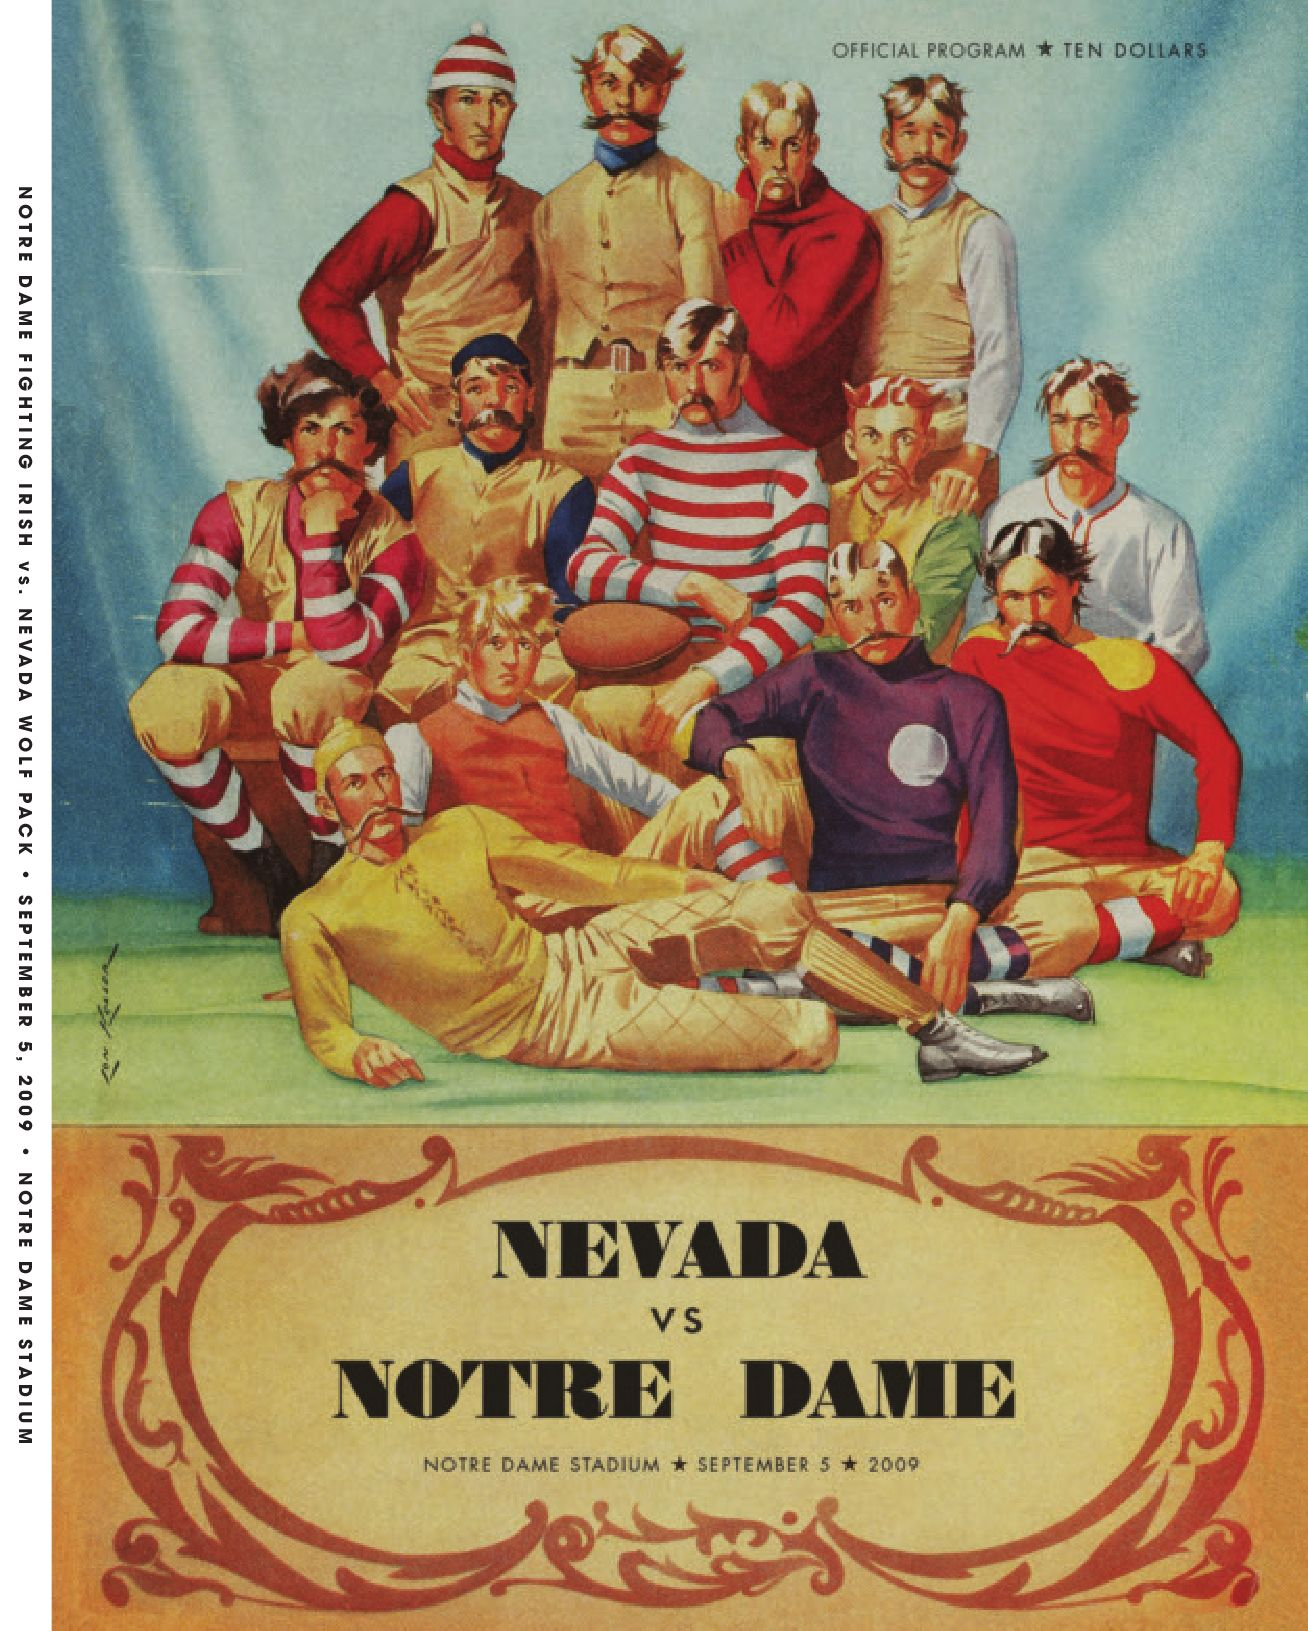 NFL Jerseys Cheap - 2009 Notre Dame Football Game Program - Sept. 5 vs. Nevada by ...